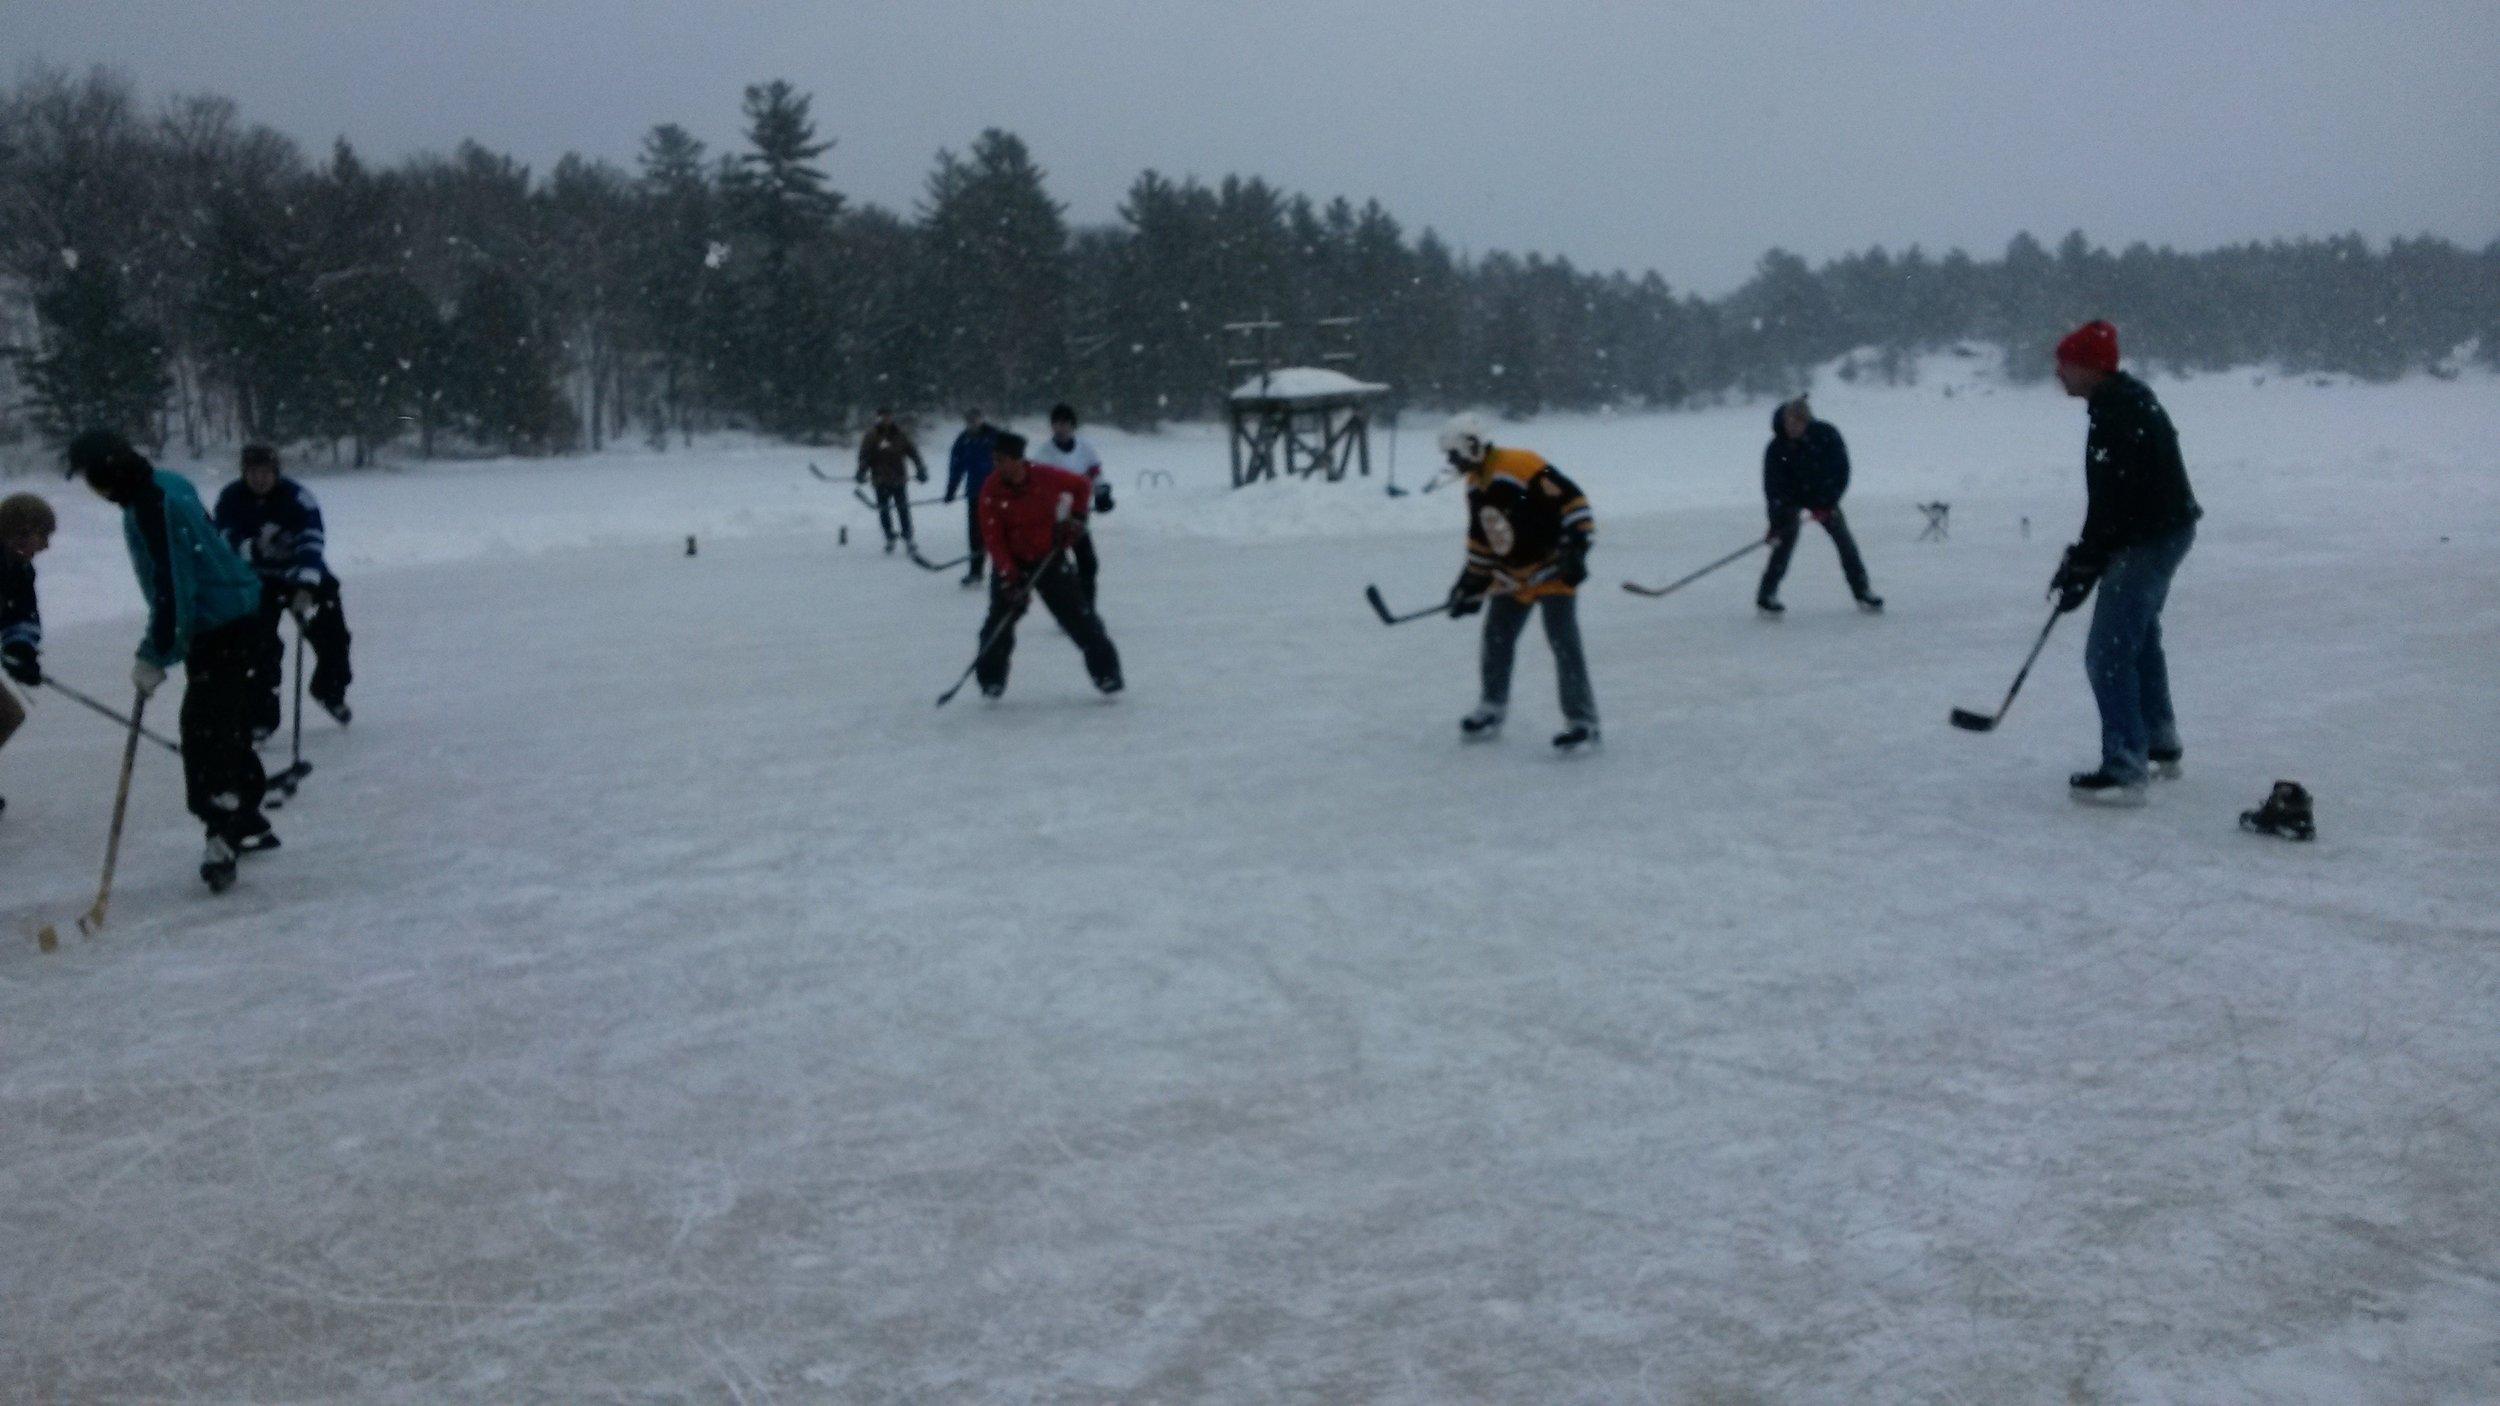 LakeHockey.jpg